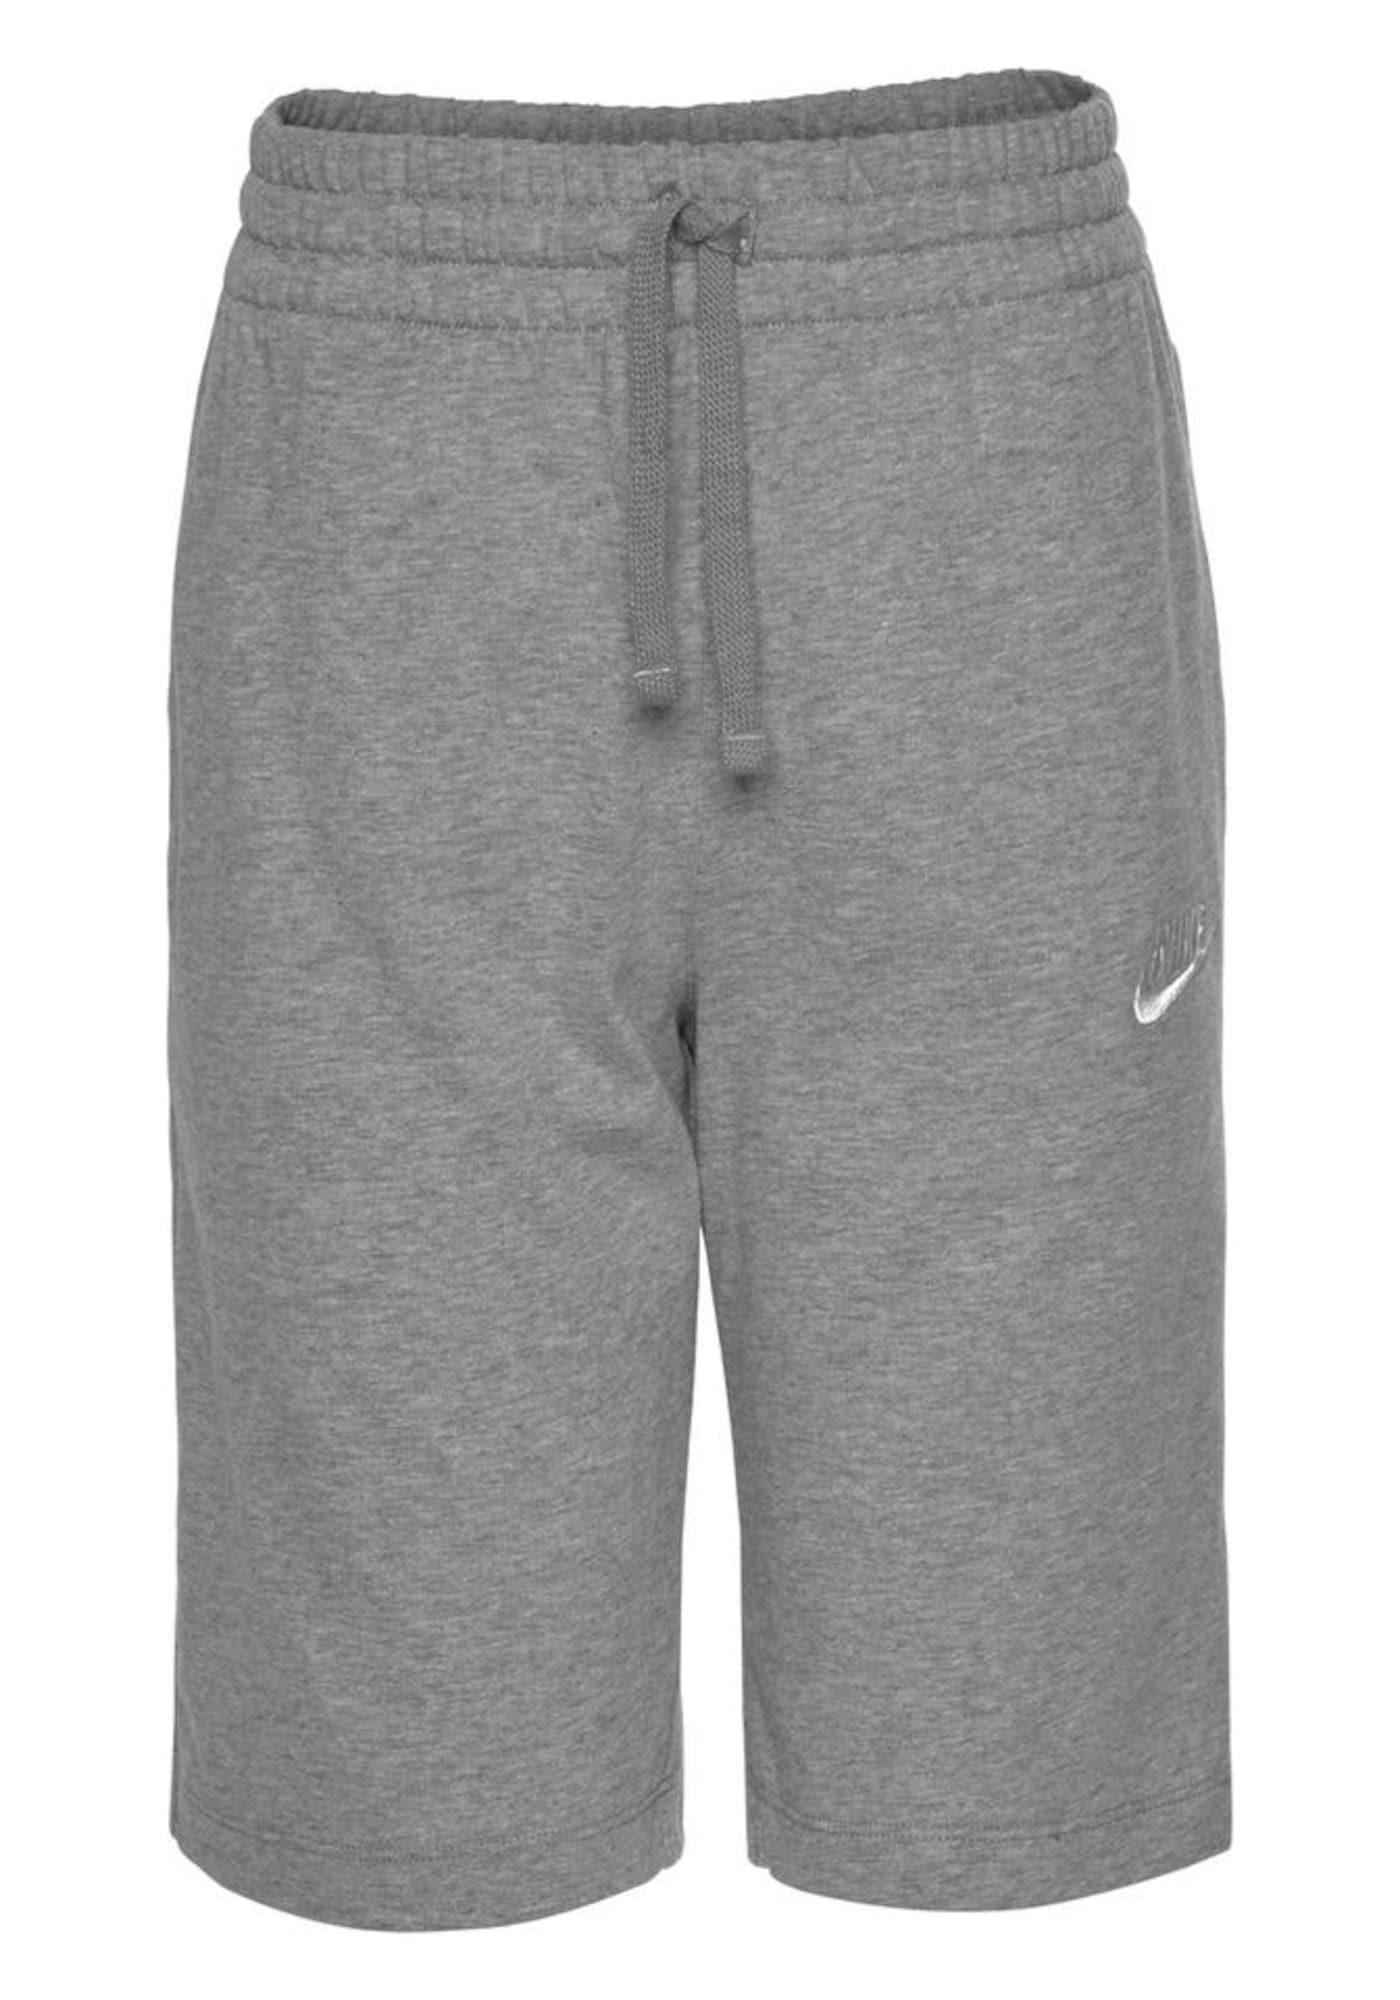 Nike Sportswear Kelnės margai pilka / balta